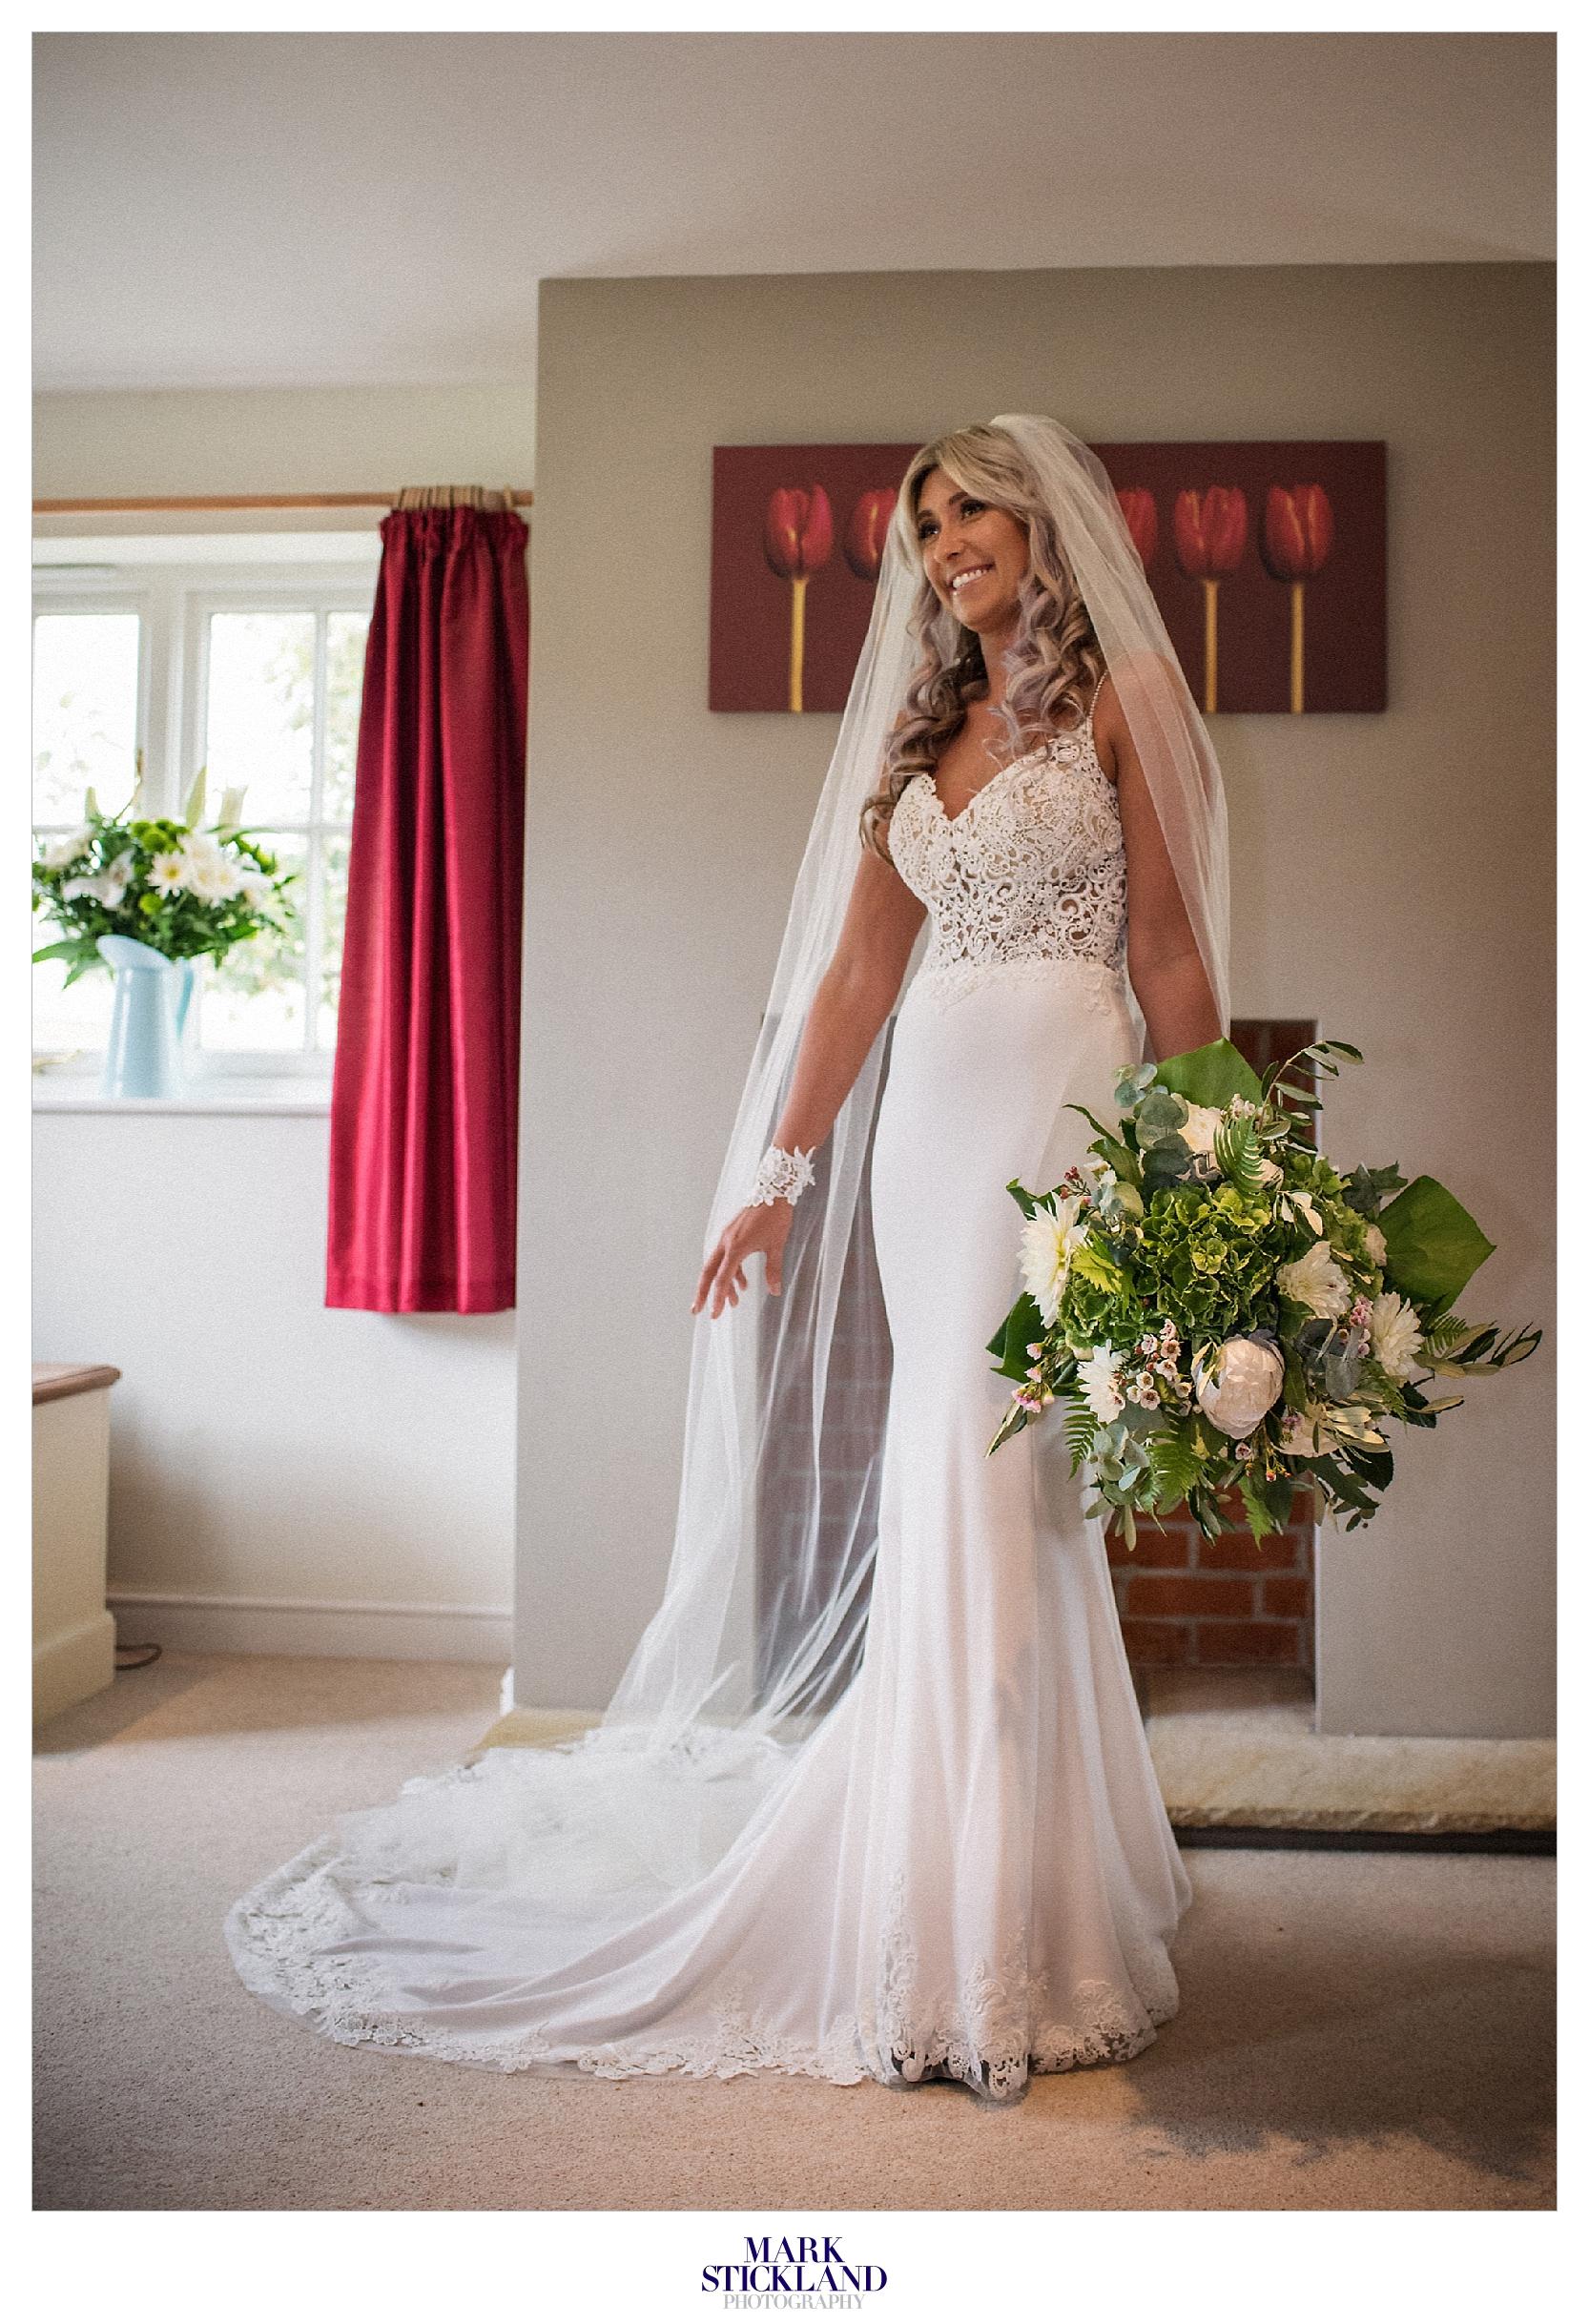 lulworth_castle_wedding_dorset_0001a